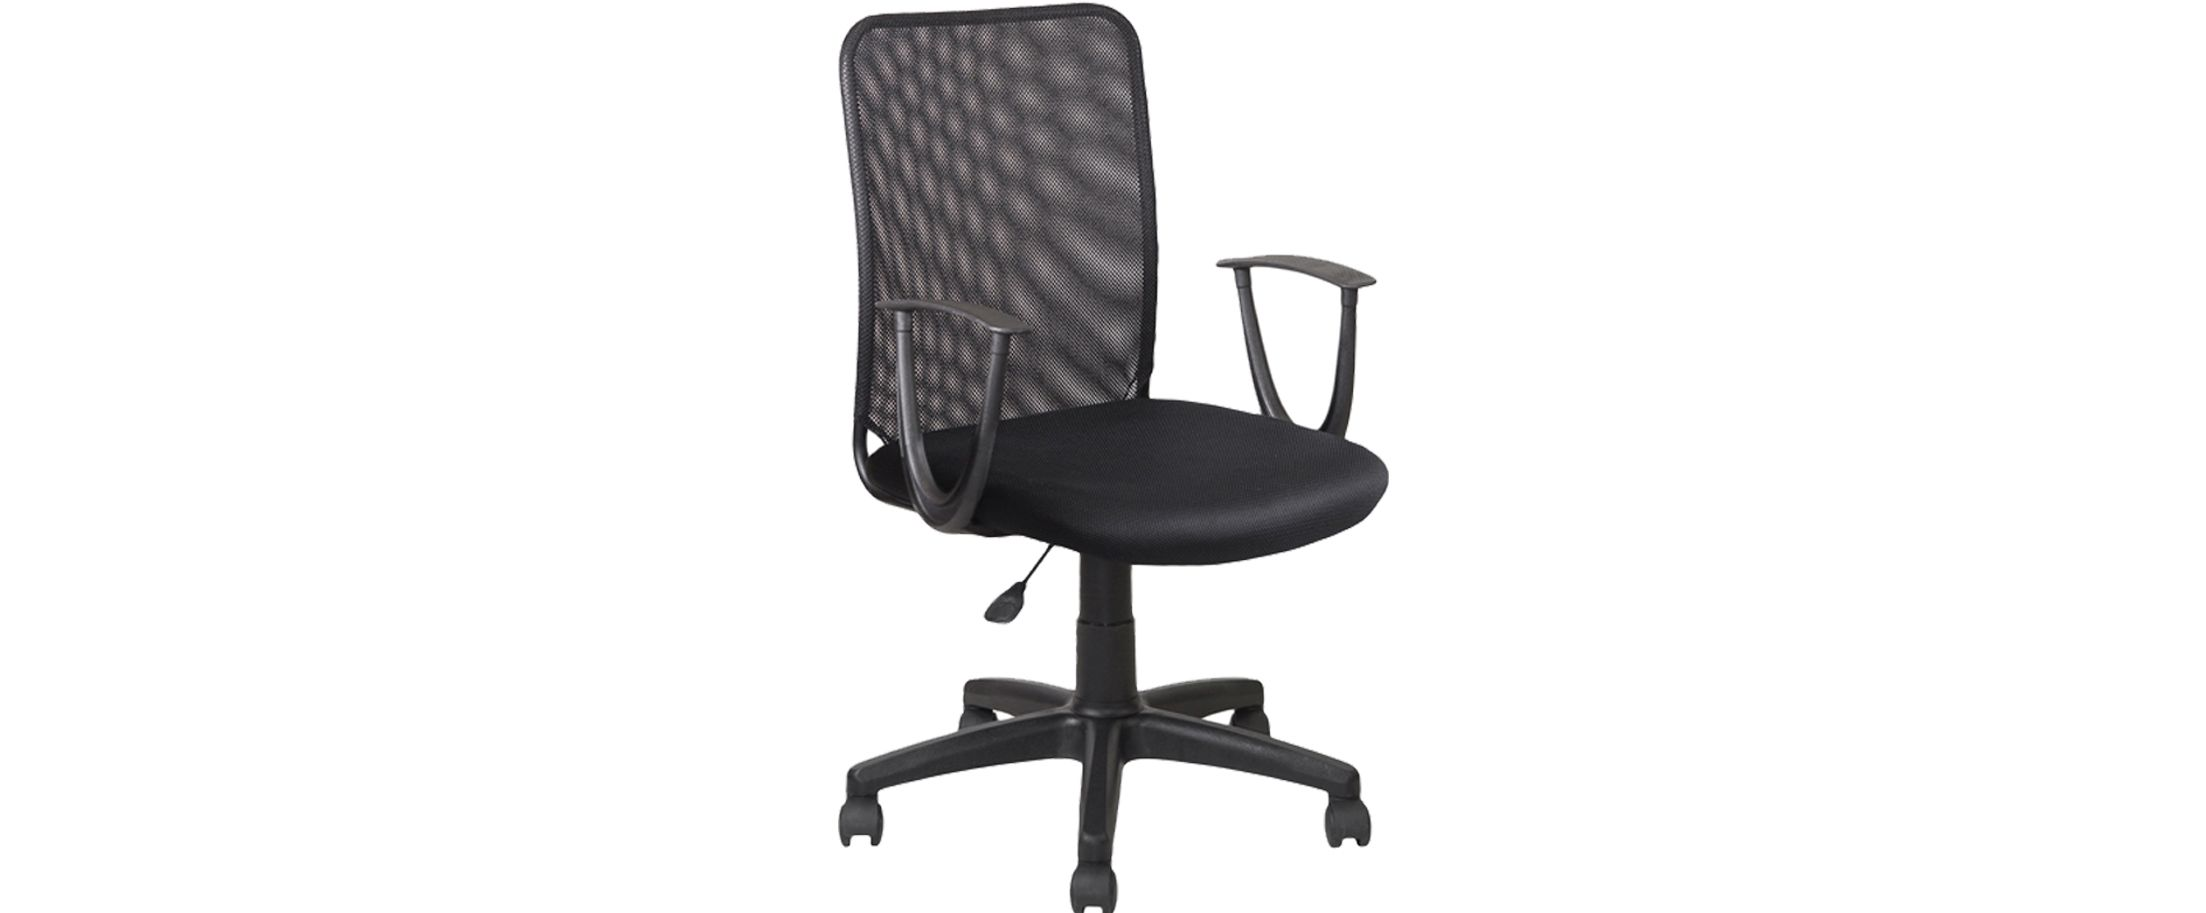 Кресло офисное AV 220 сетка черная Модель 999Кресло офисное AV 220 сетка черная Модель 999. Артикул Д000748<br>